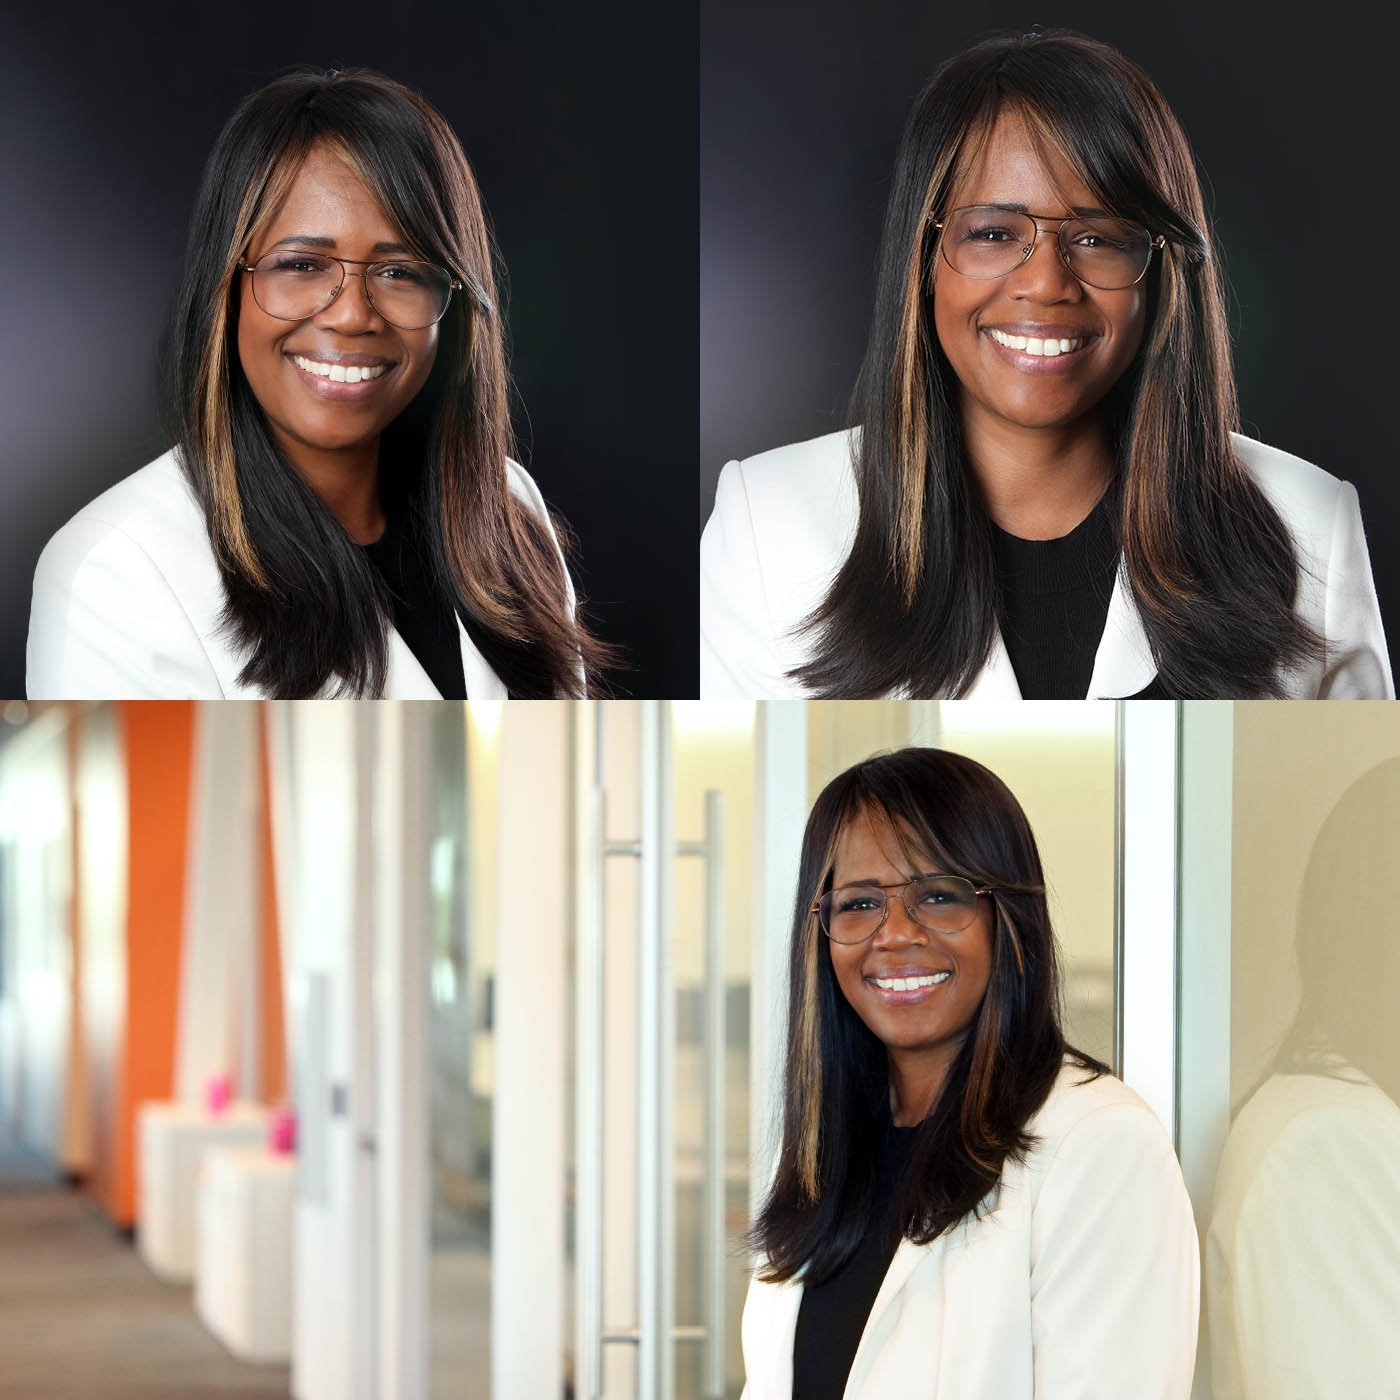 female business photos